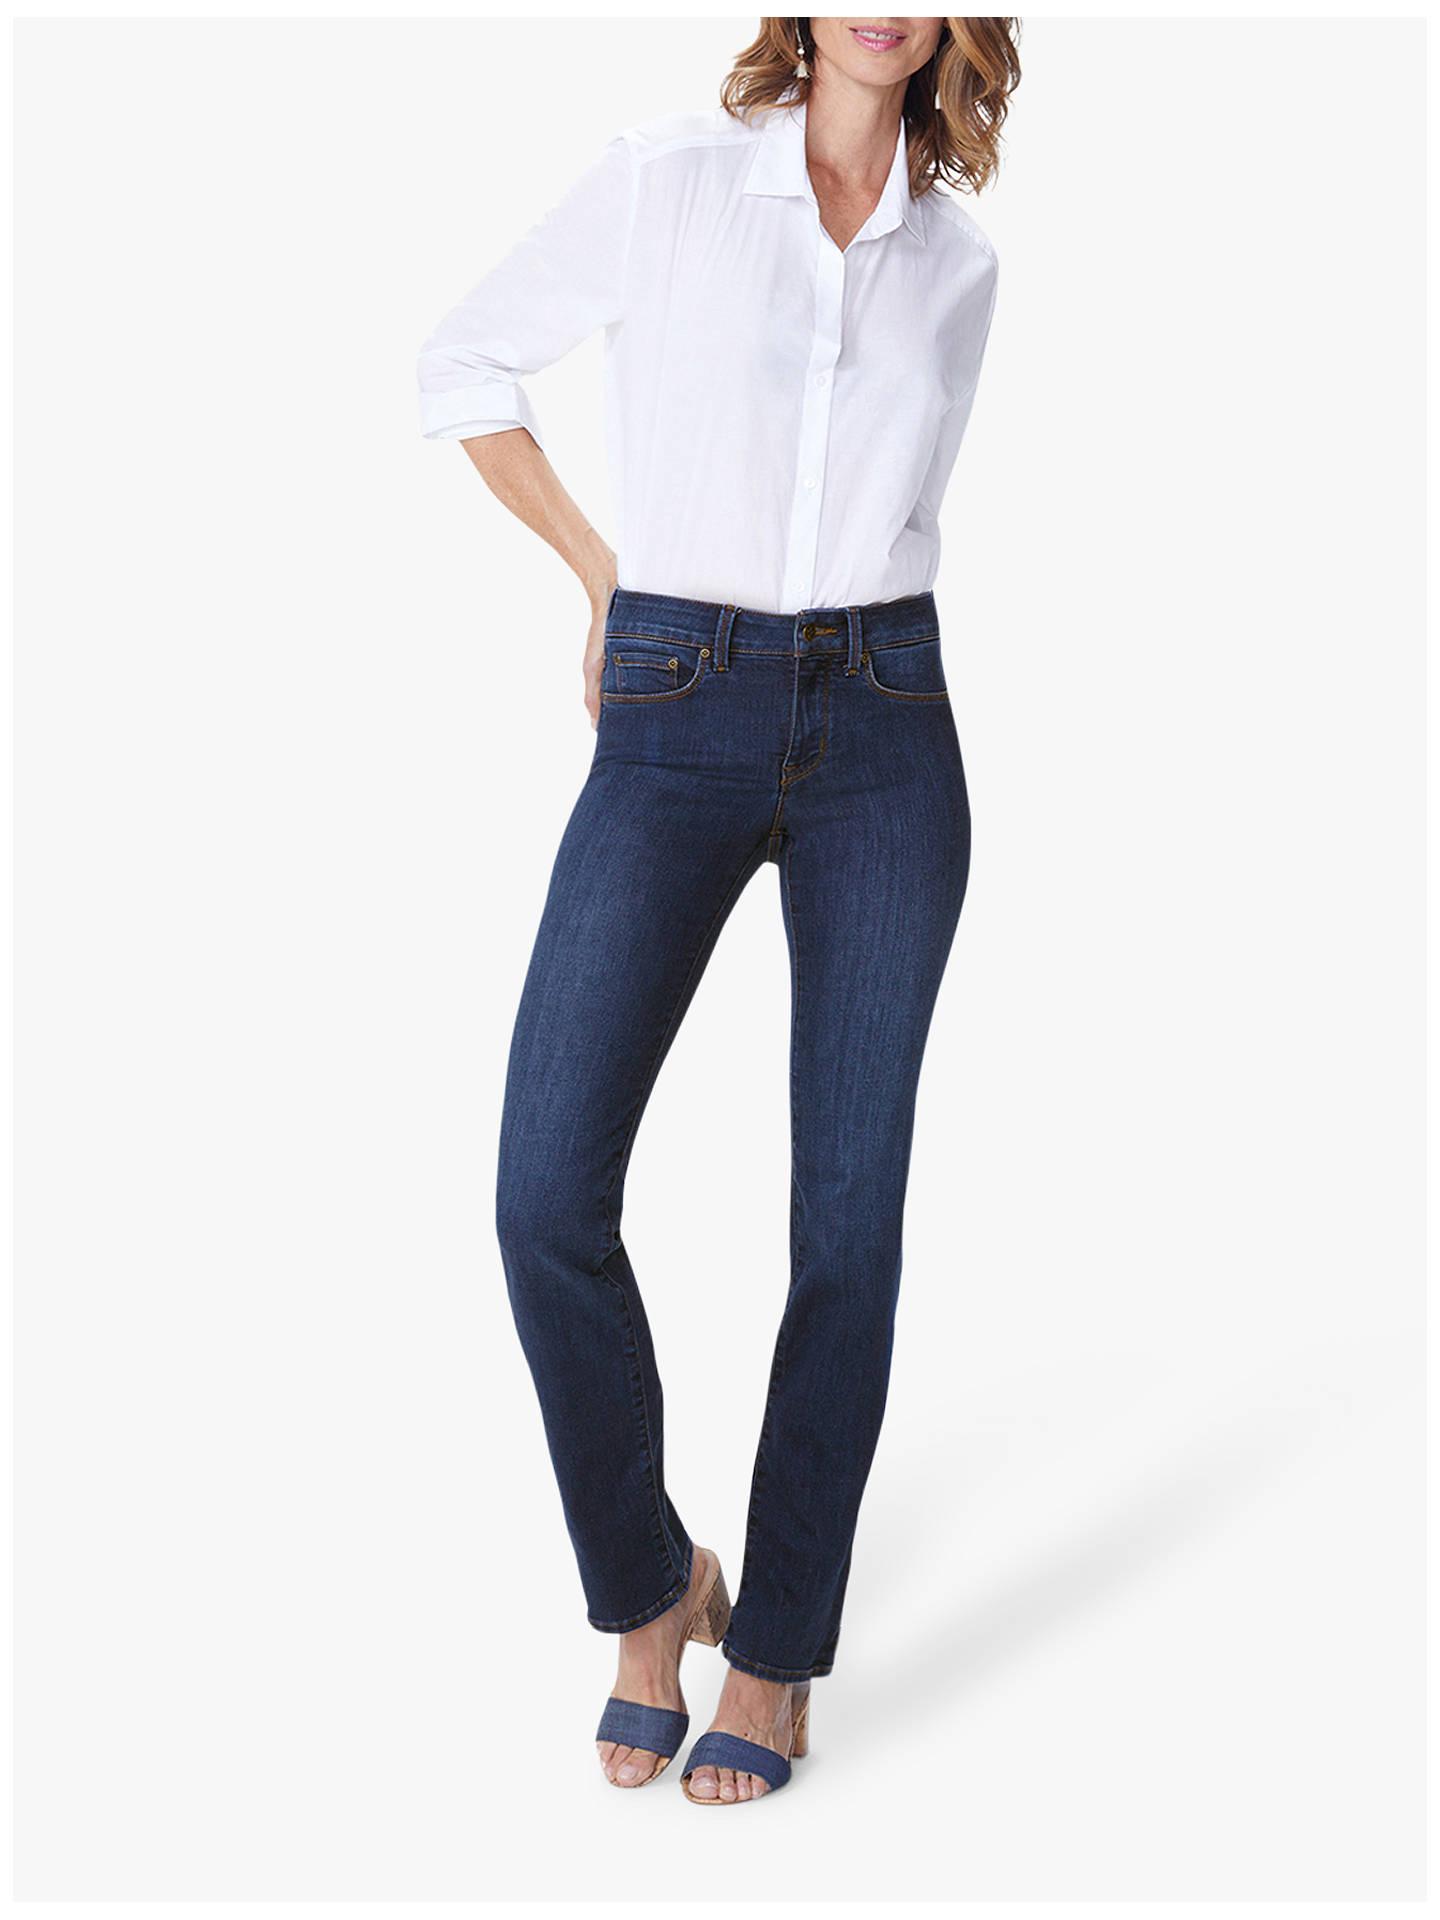 824158b9acf Buy NYDJ Marilyn Straight Leg Regular Jeans